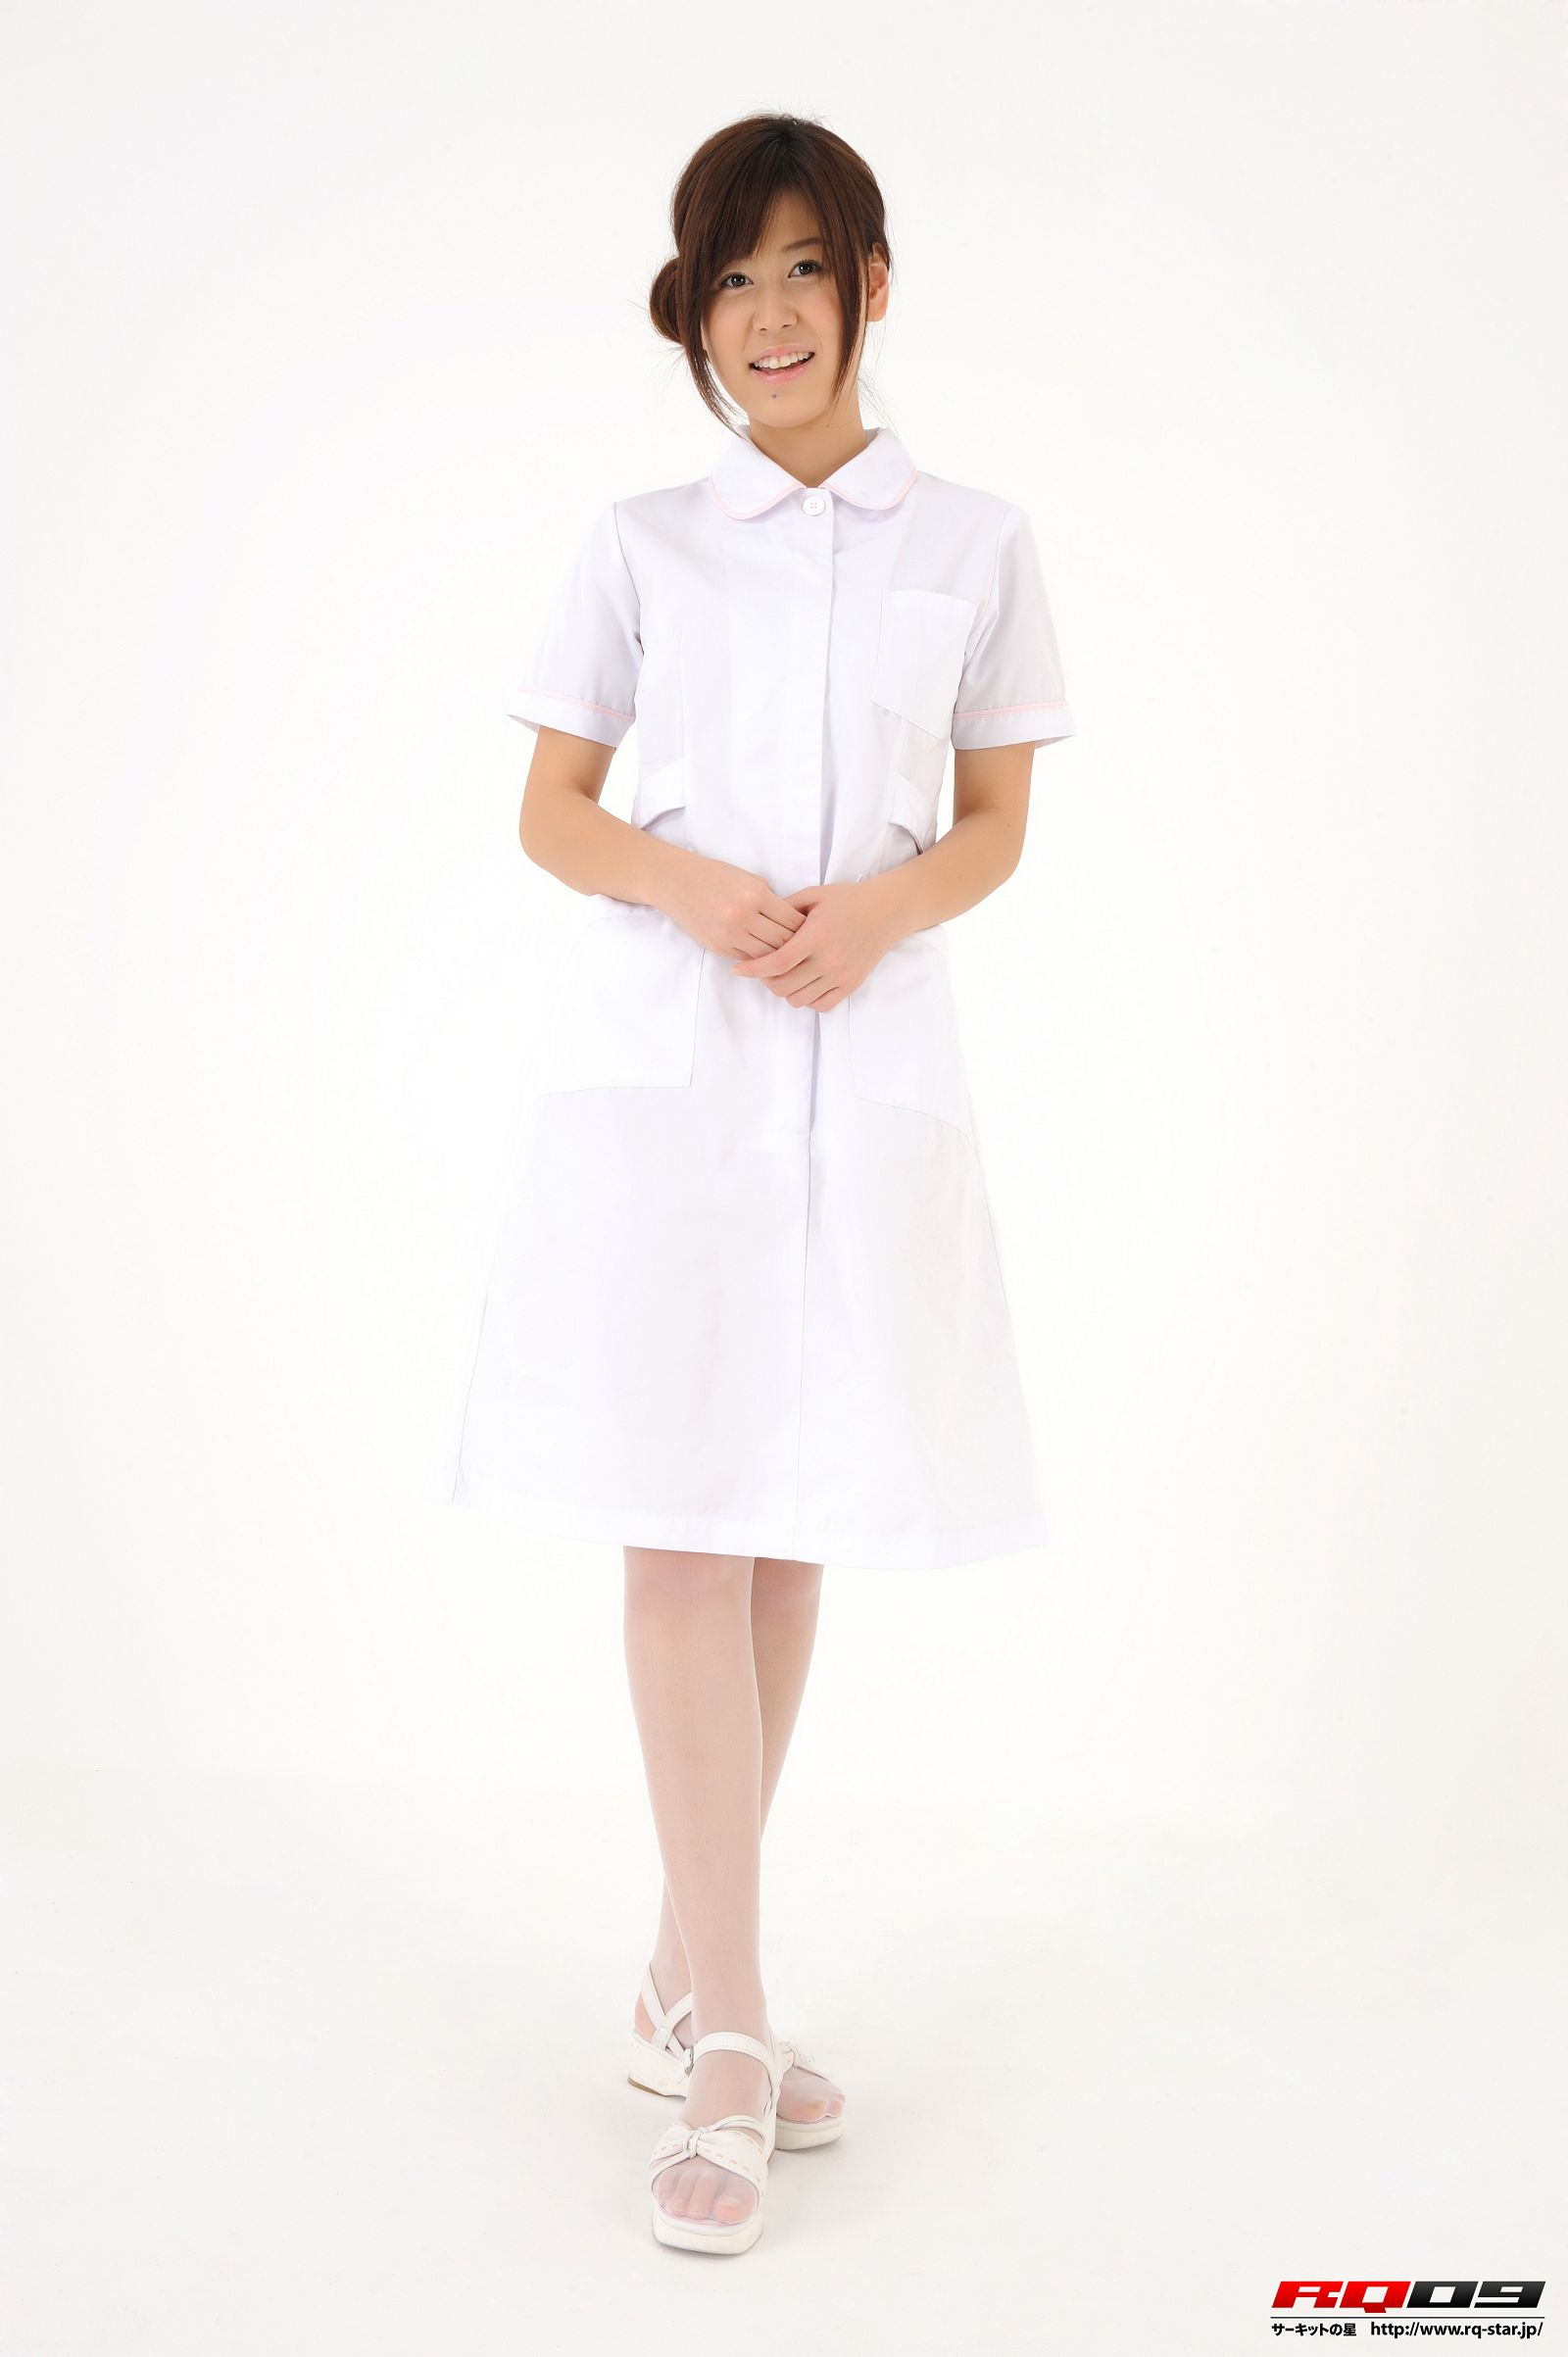 [RQ STAR美女] NO.0138 Airi Nagasaku 永作あいり Nurse Costume[40P] RQ STAR 第2张